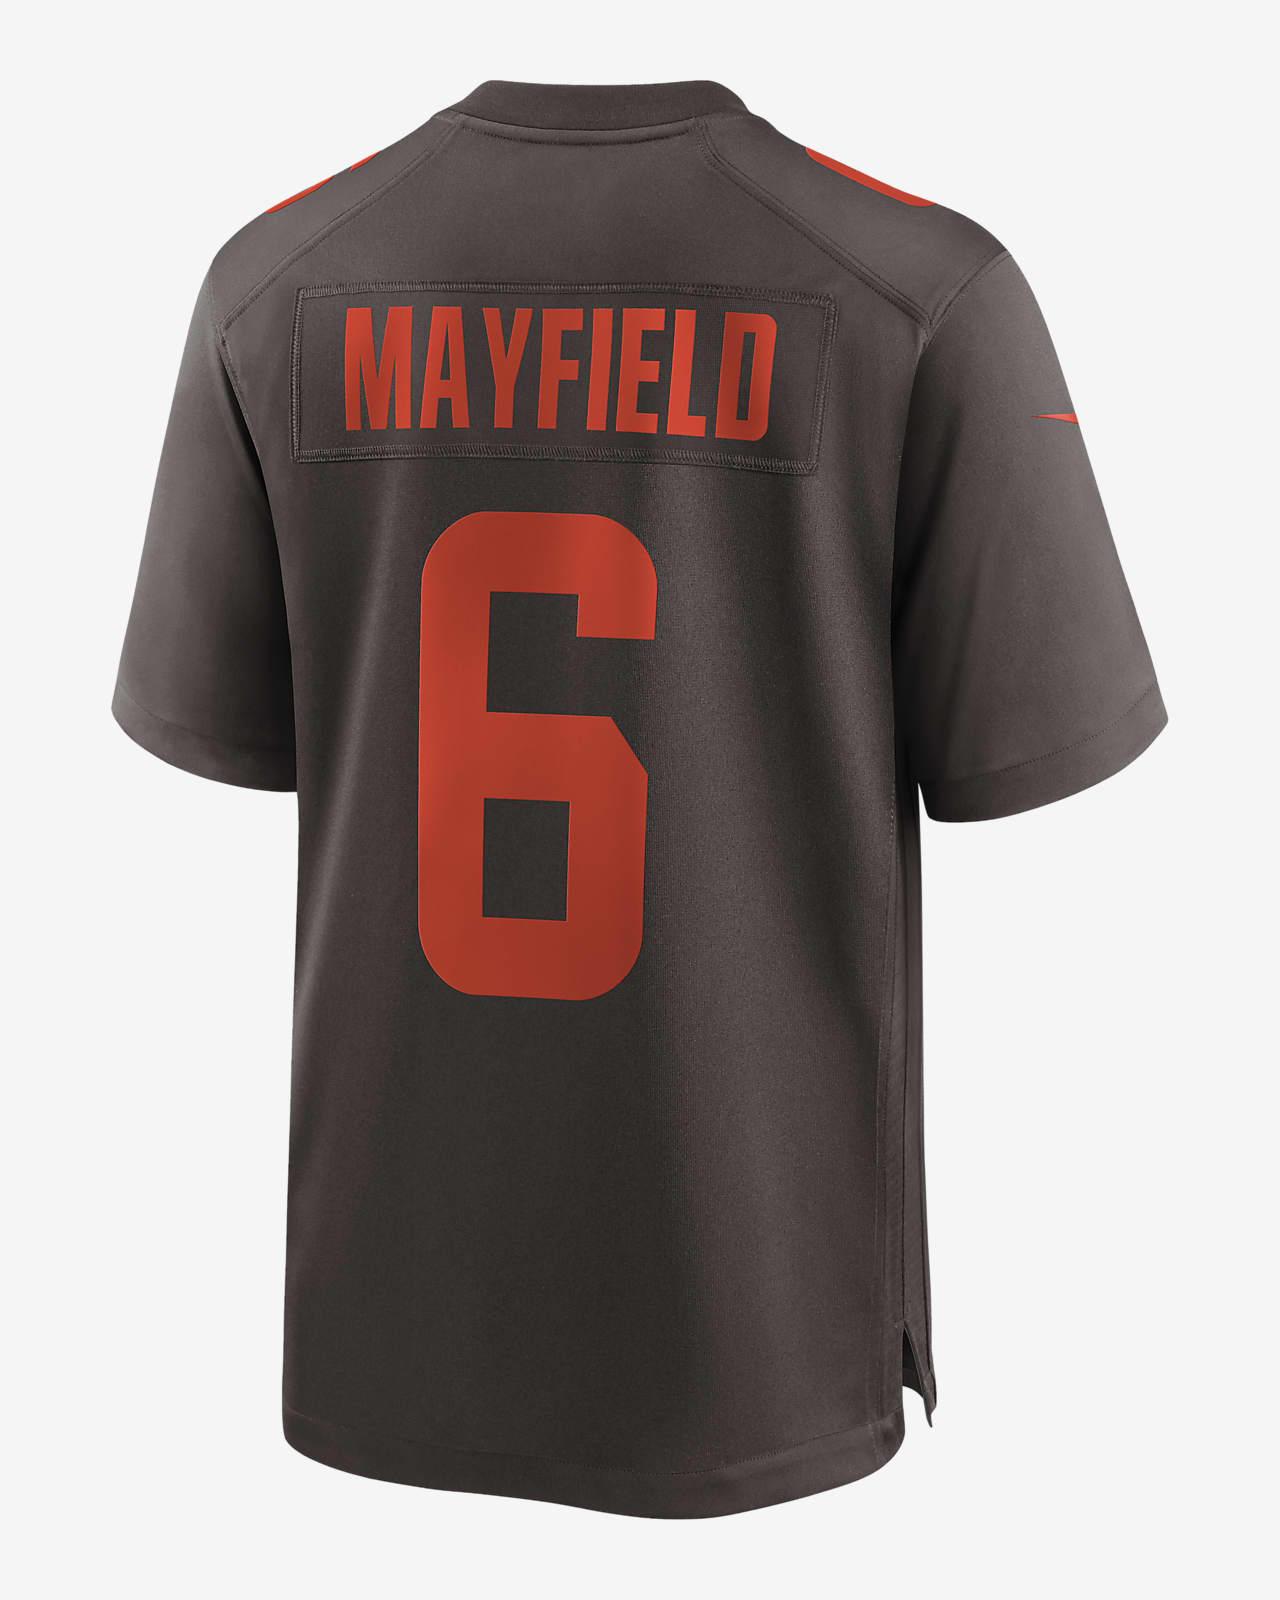 baker mayfield jersey nfl